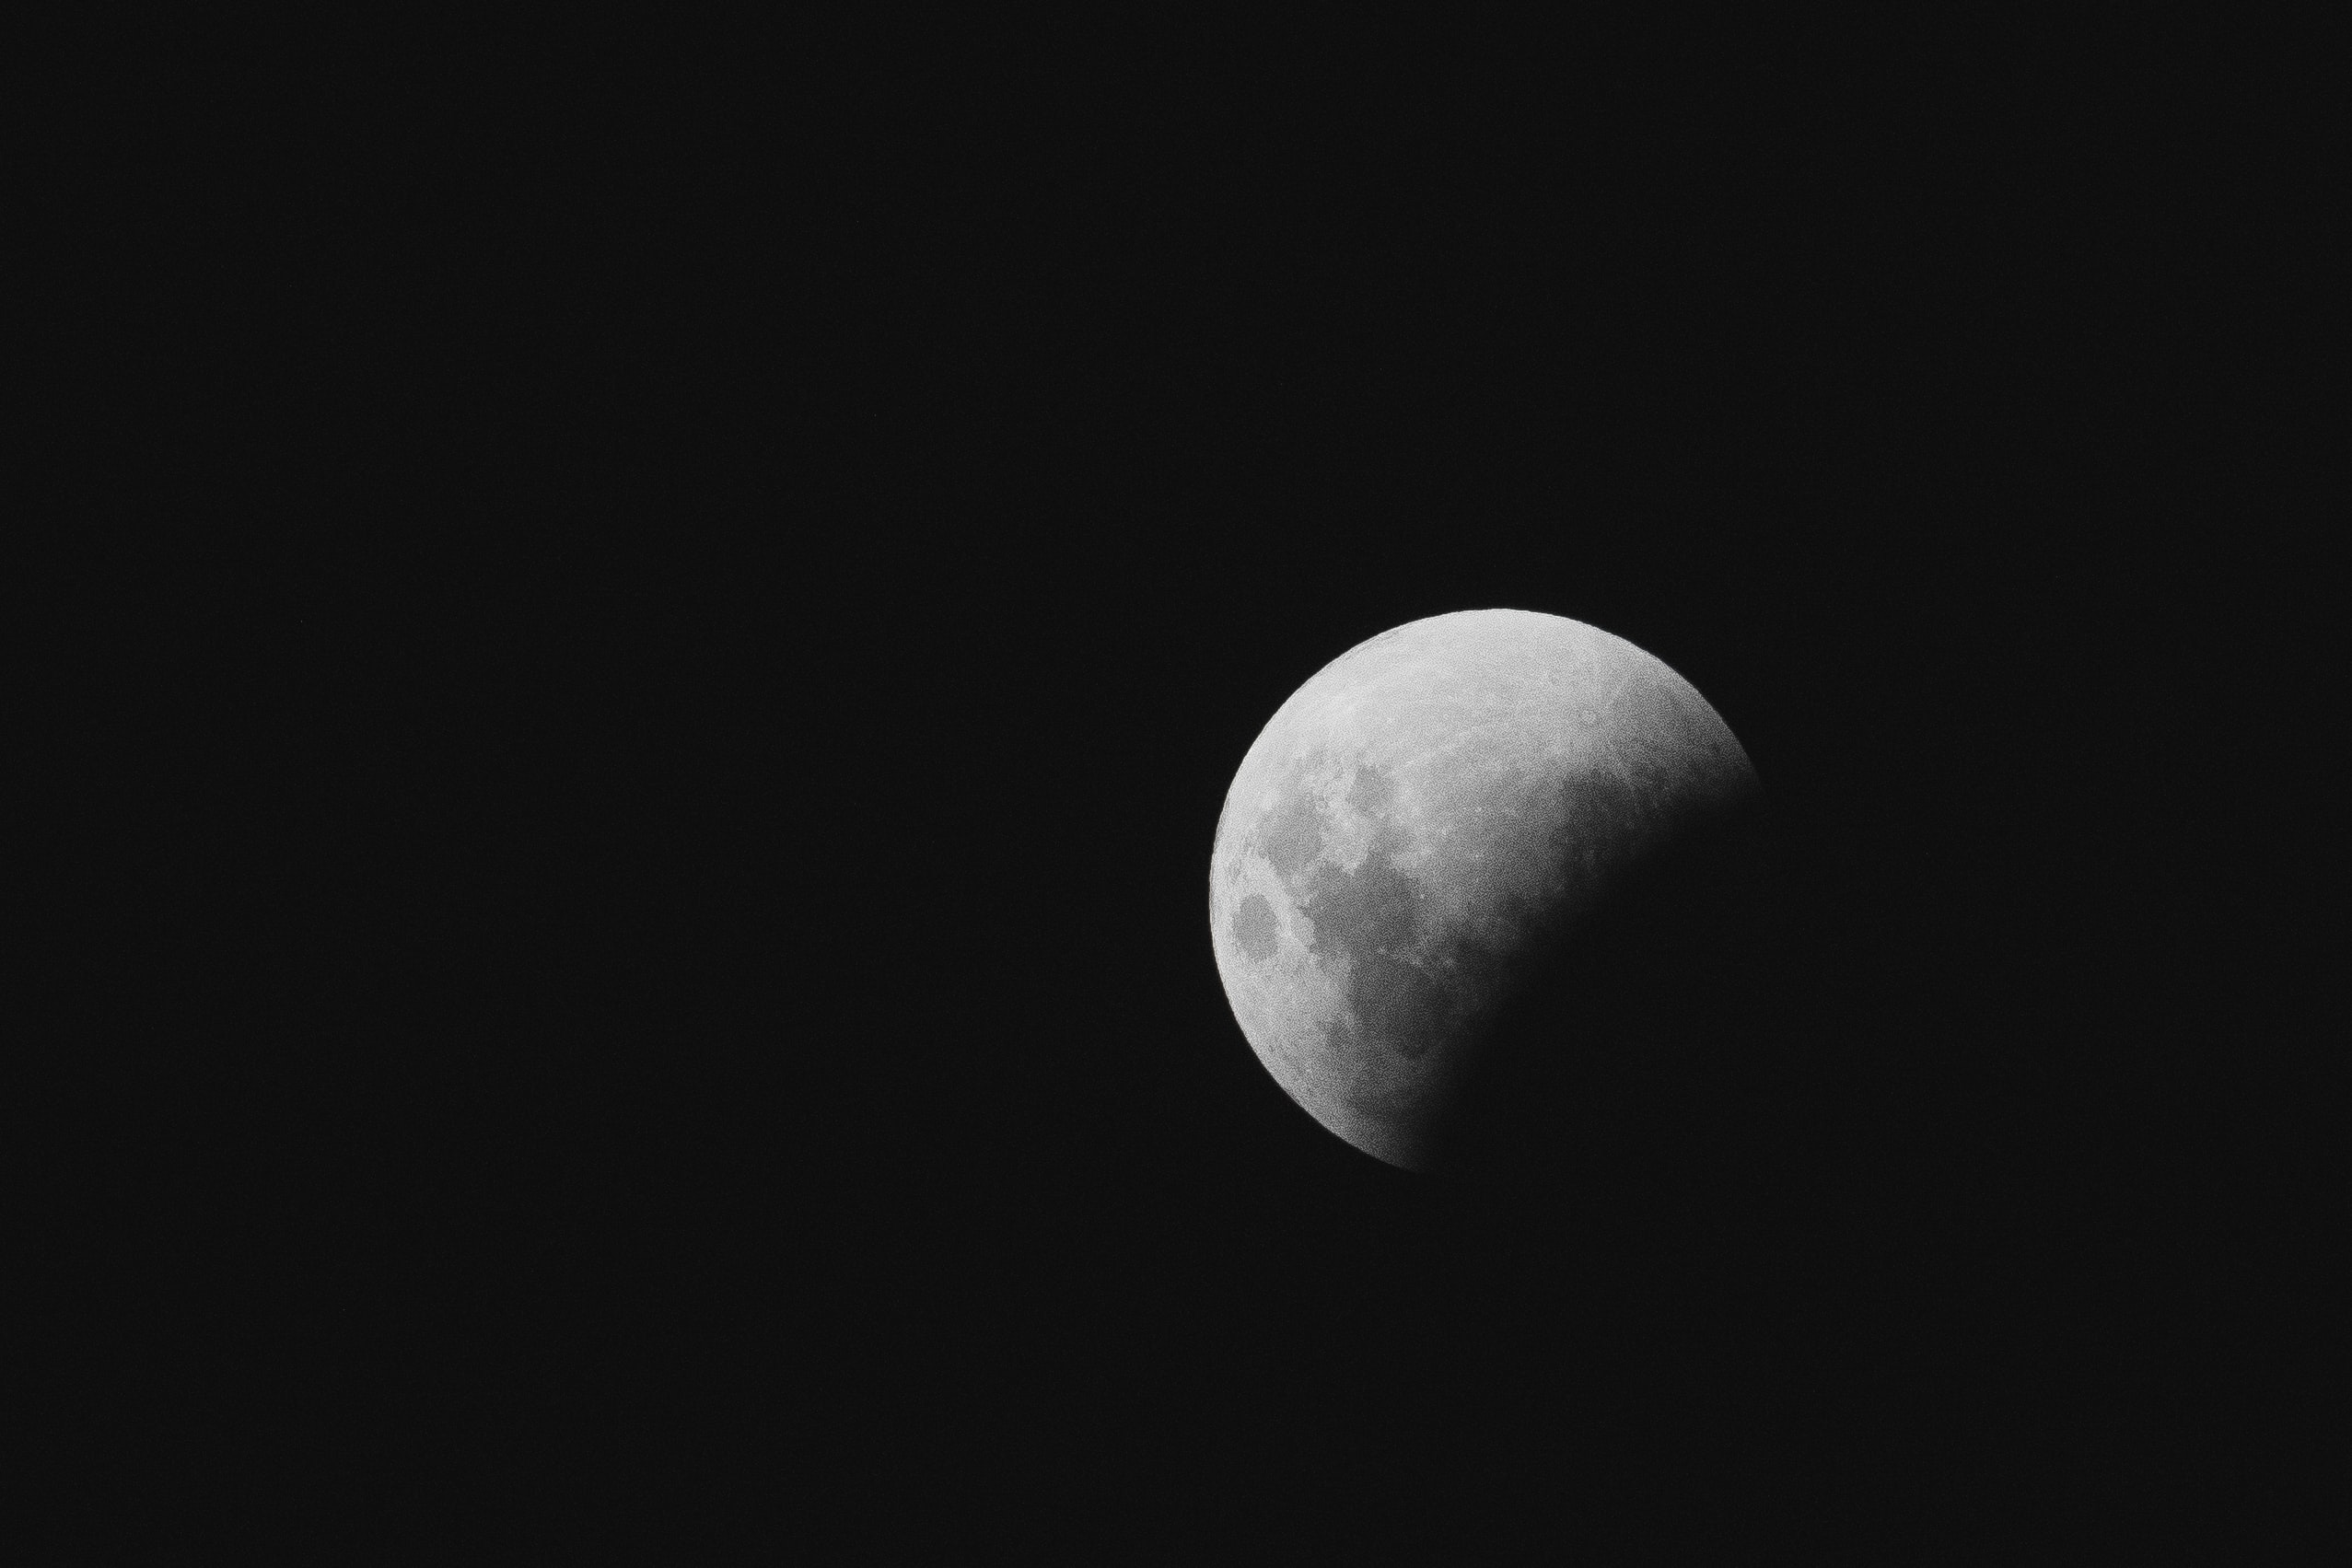 gray moon photograph